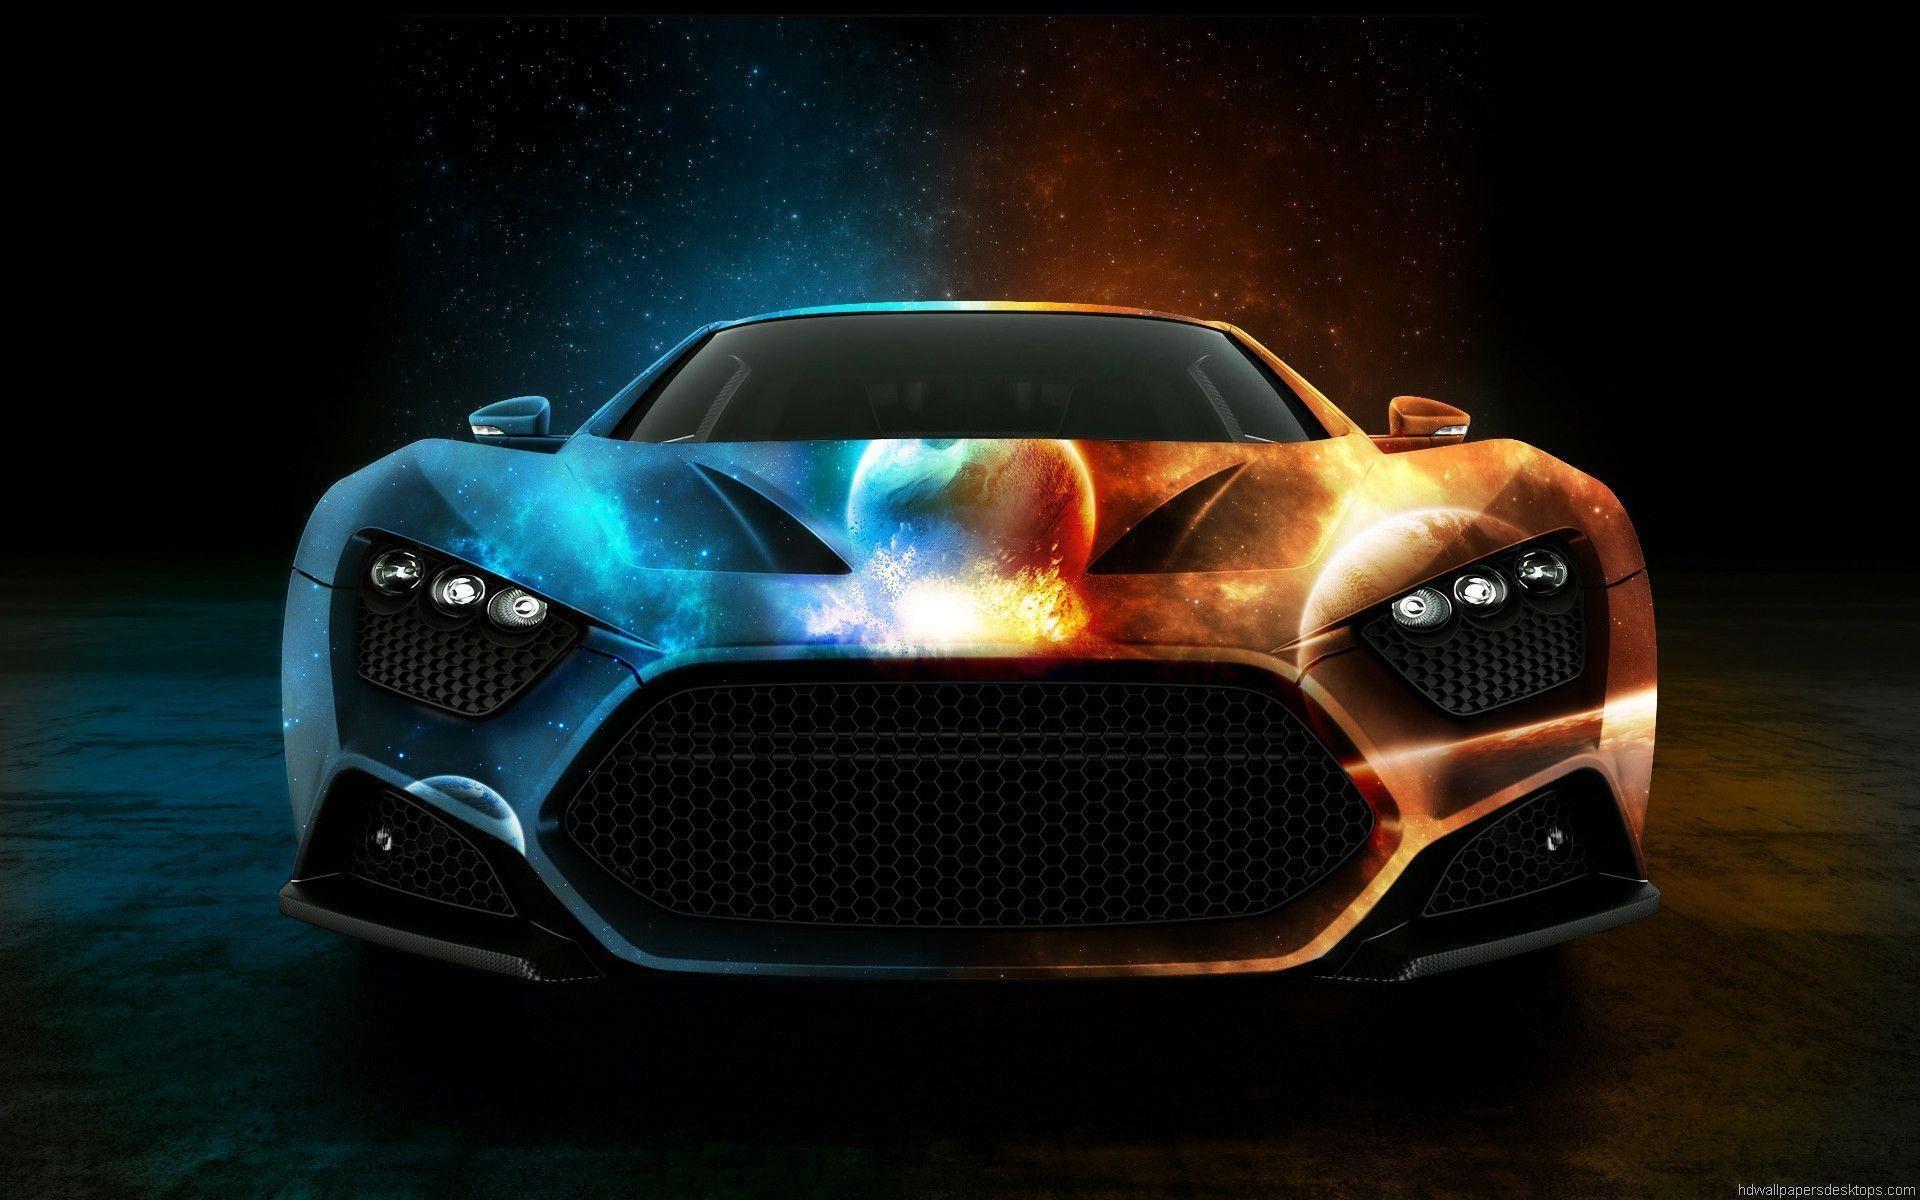 Full Hd Car Wallpapers 1080P Desktop Hd Pictures 4 HD Wallpapers .